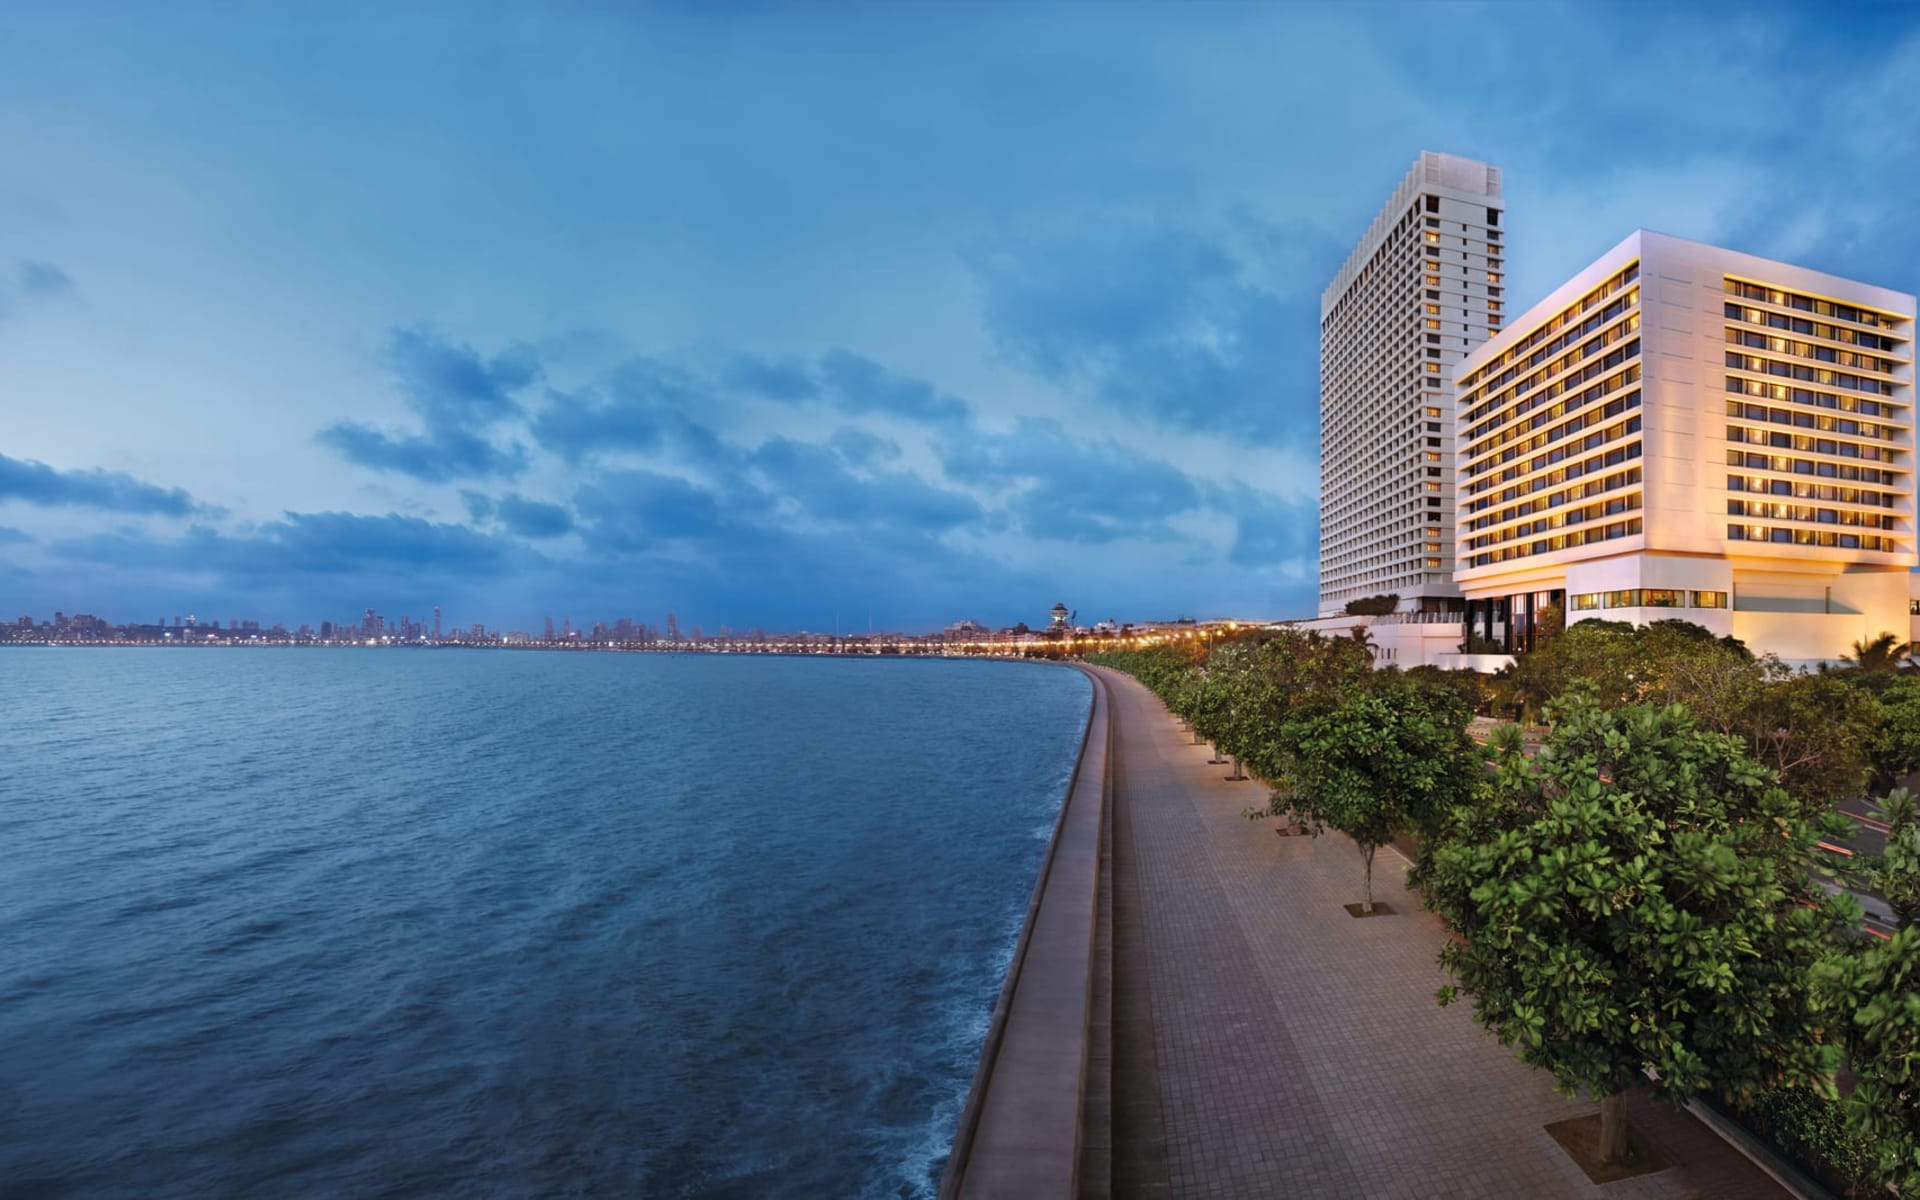 The Oberoi in Mumbai: